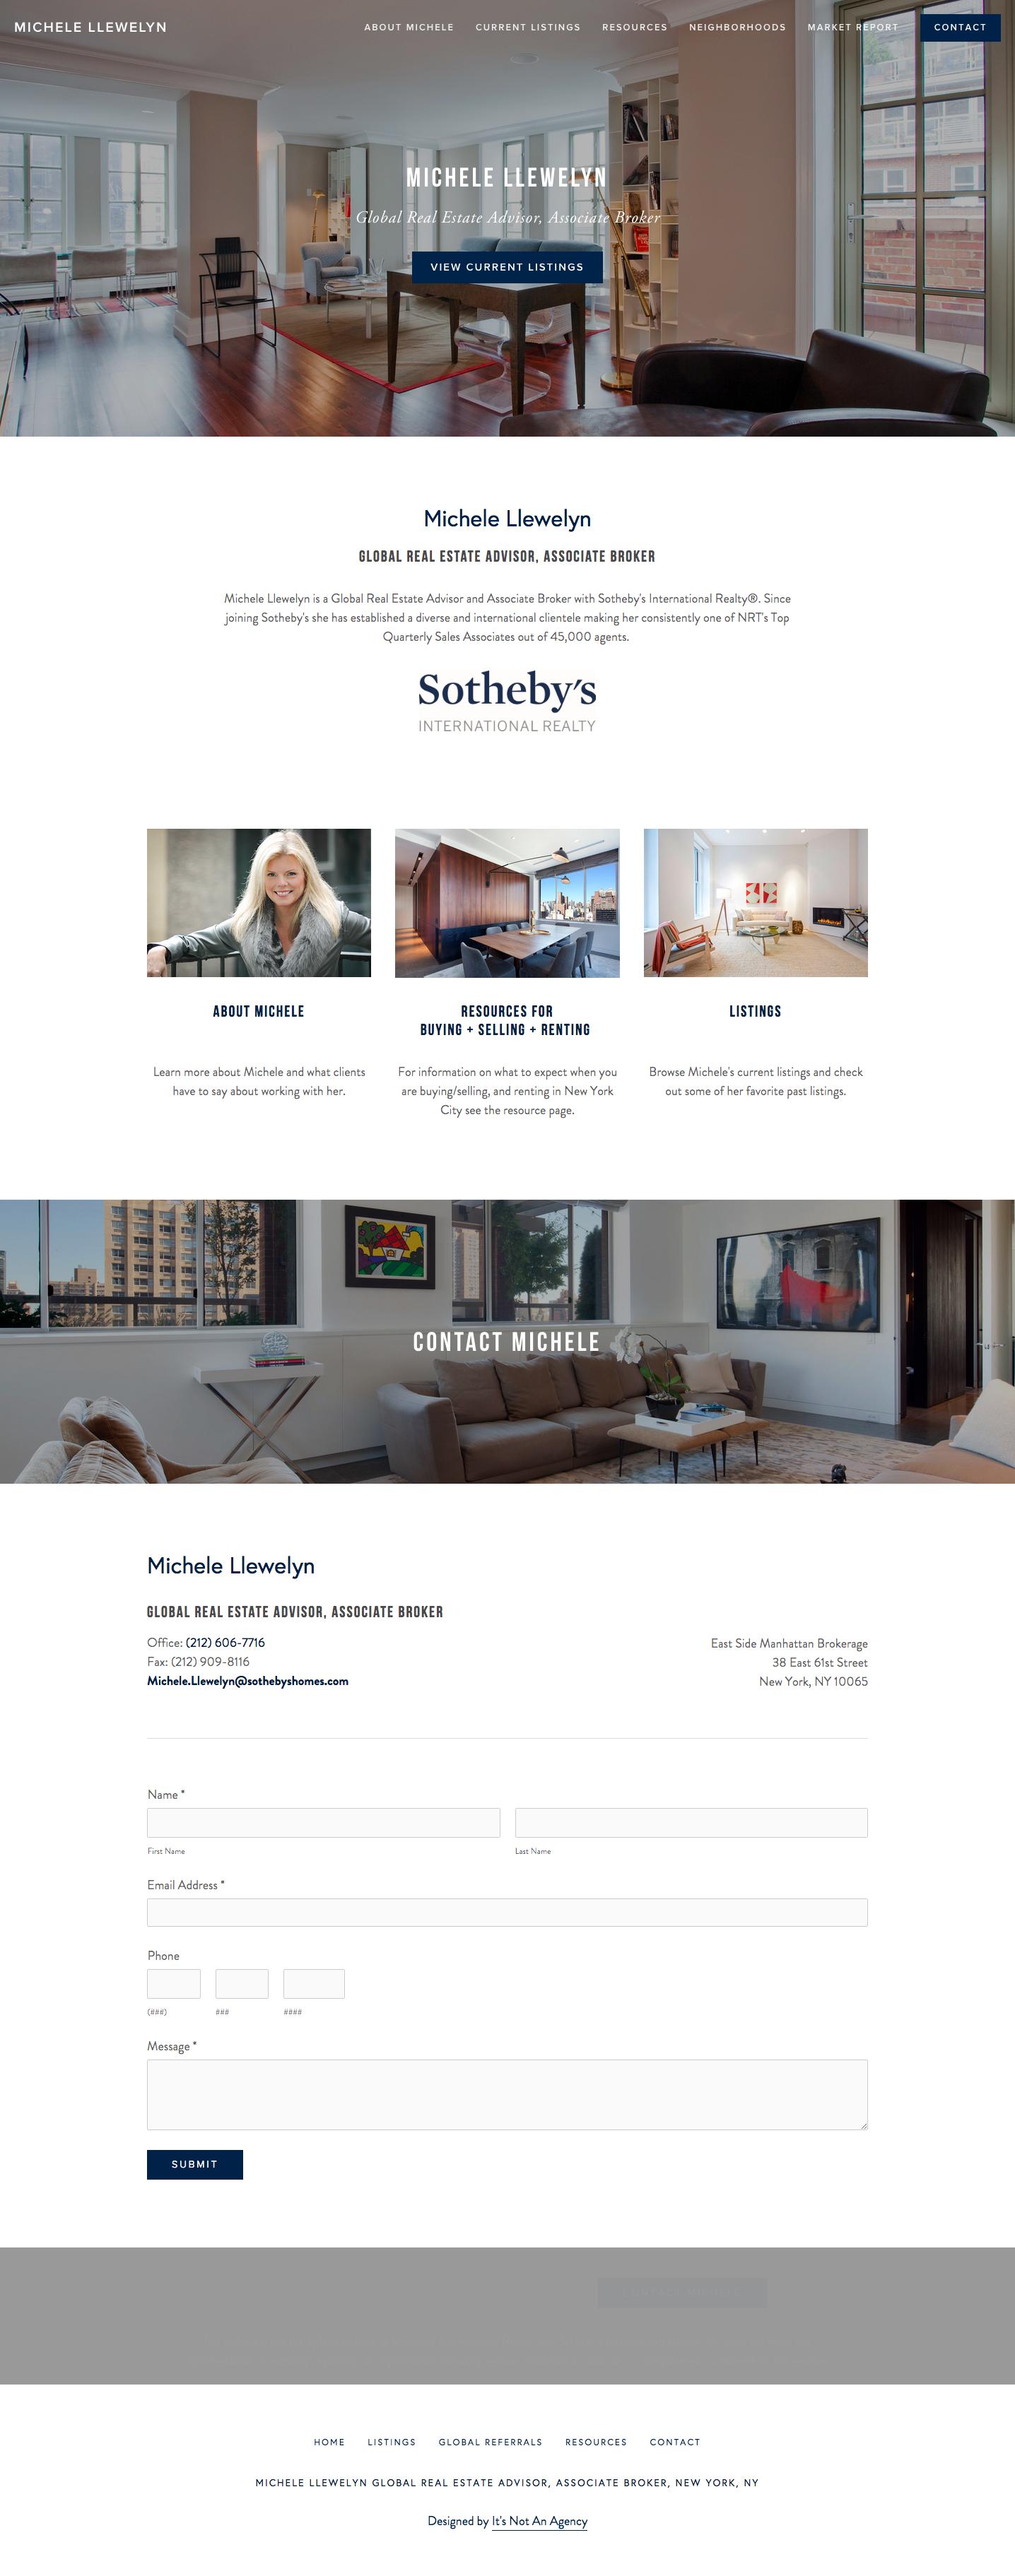 Real Estate Website_Michele Llewelyn1.png